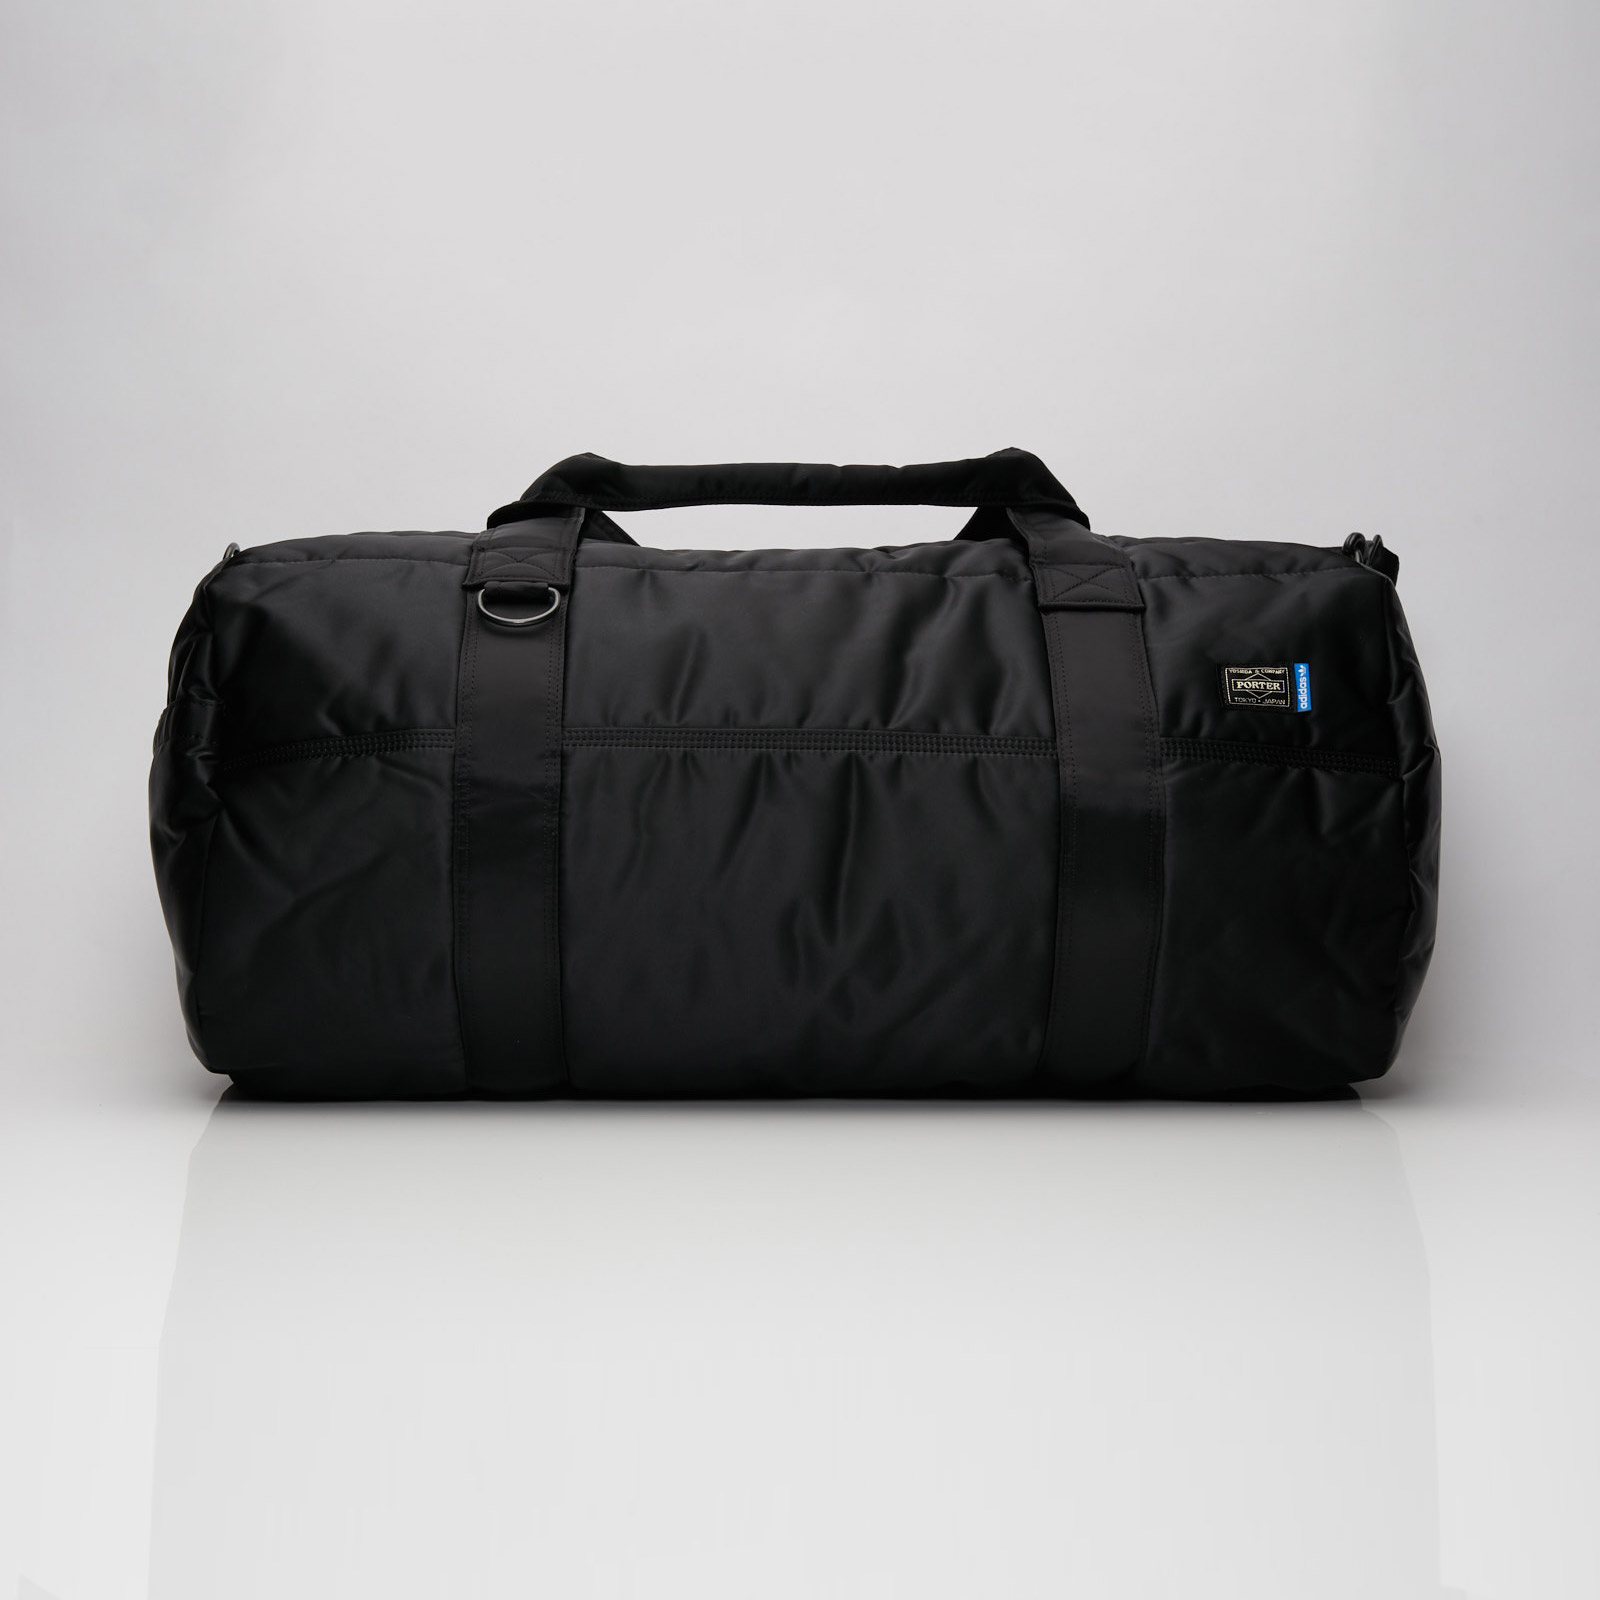 adidas 2Way Boston Bag x Porter - Cj5749 - Sneakersnstuff  cd67abda9b001